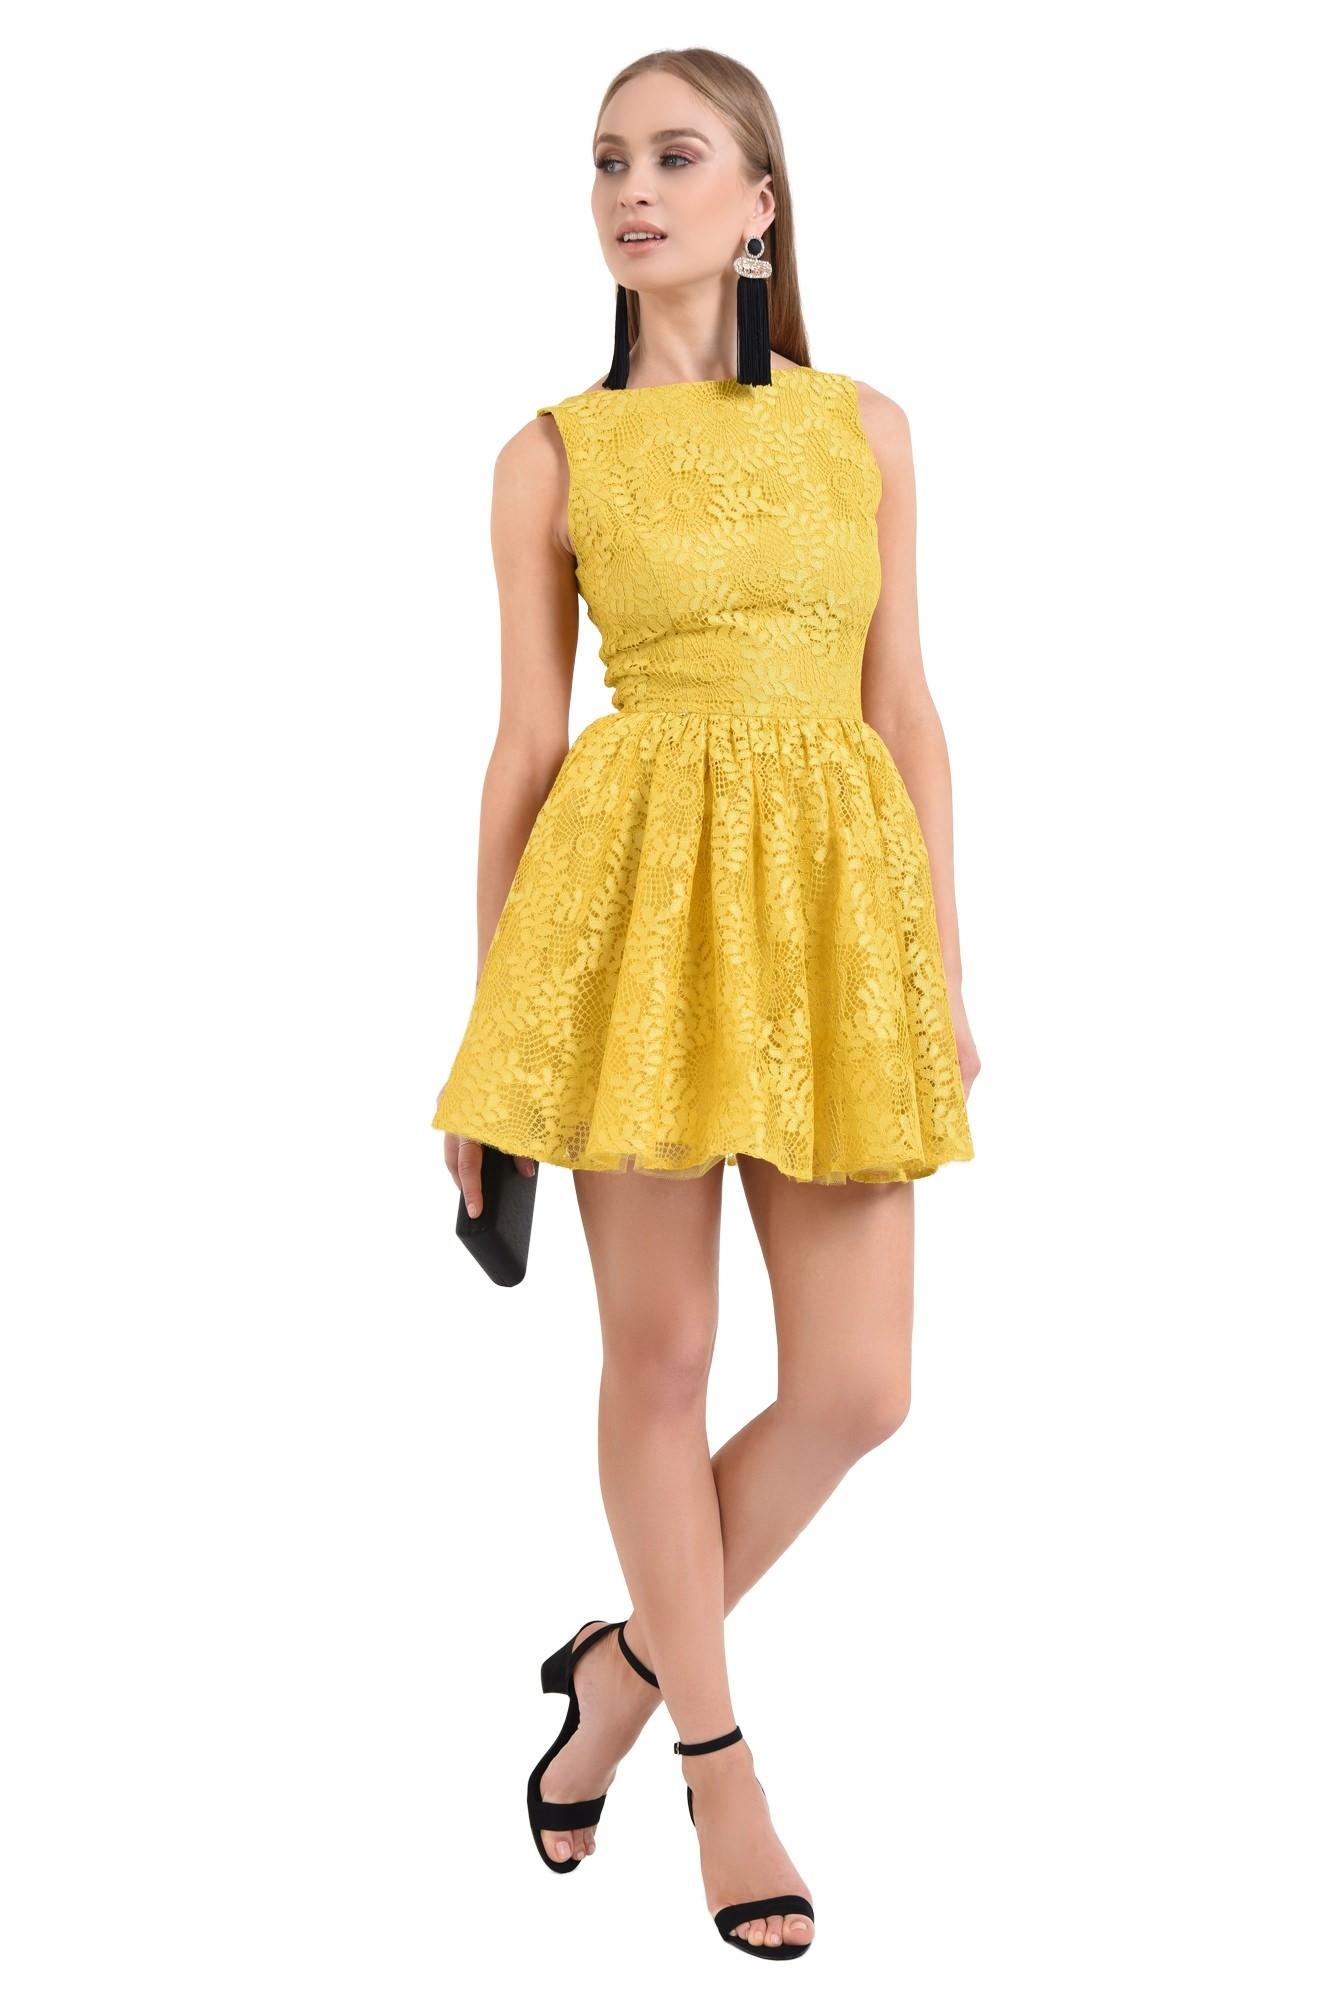 360 - rochie de seara, dantela galbena, cloche, rochii online